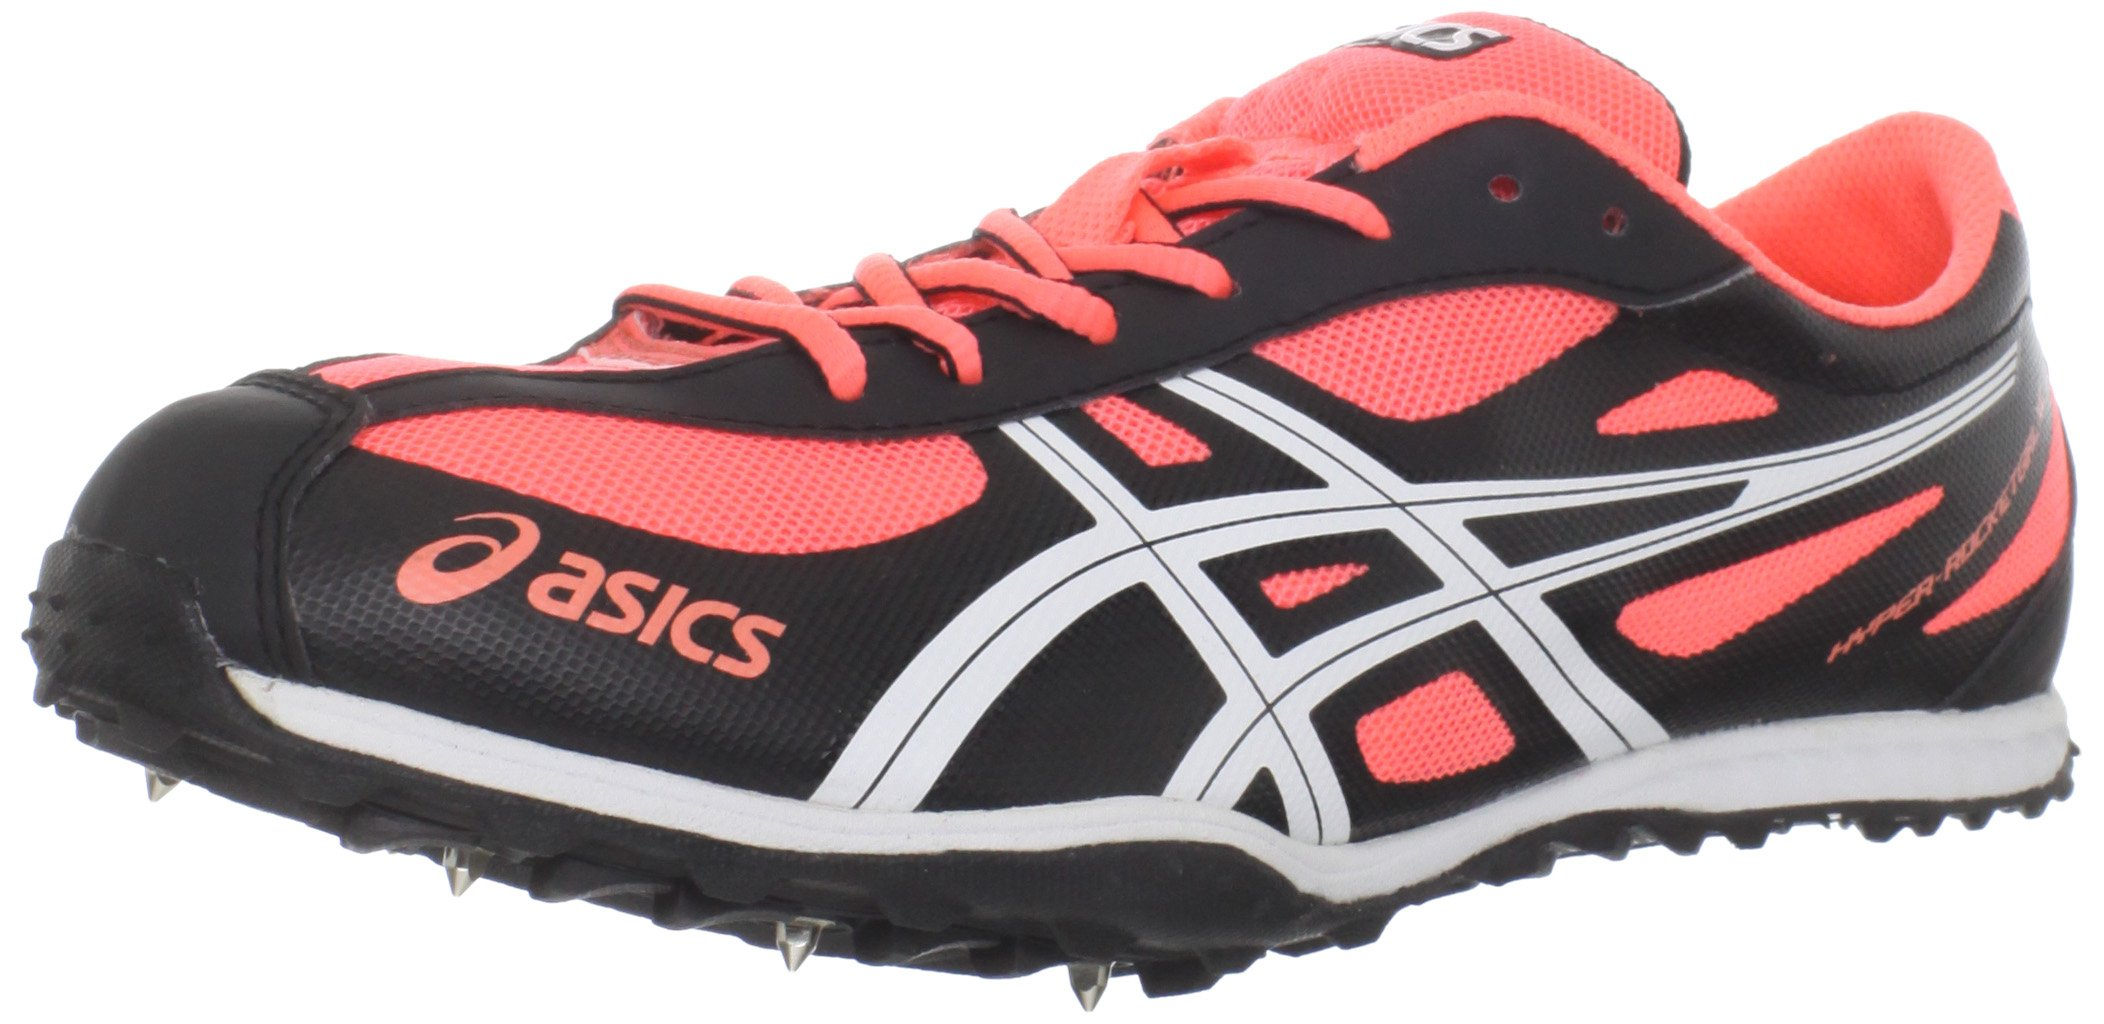 ASICS Women's Hyper-Rocketgirl XC Cross-Country Shoe